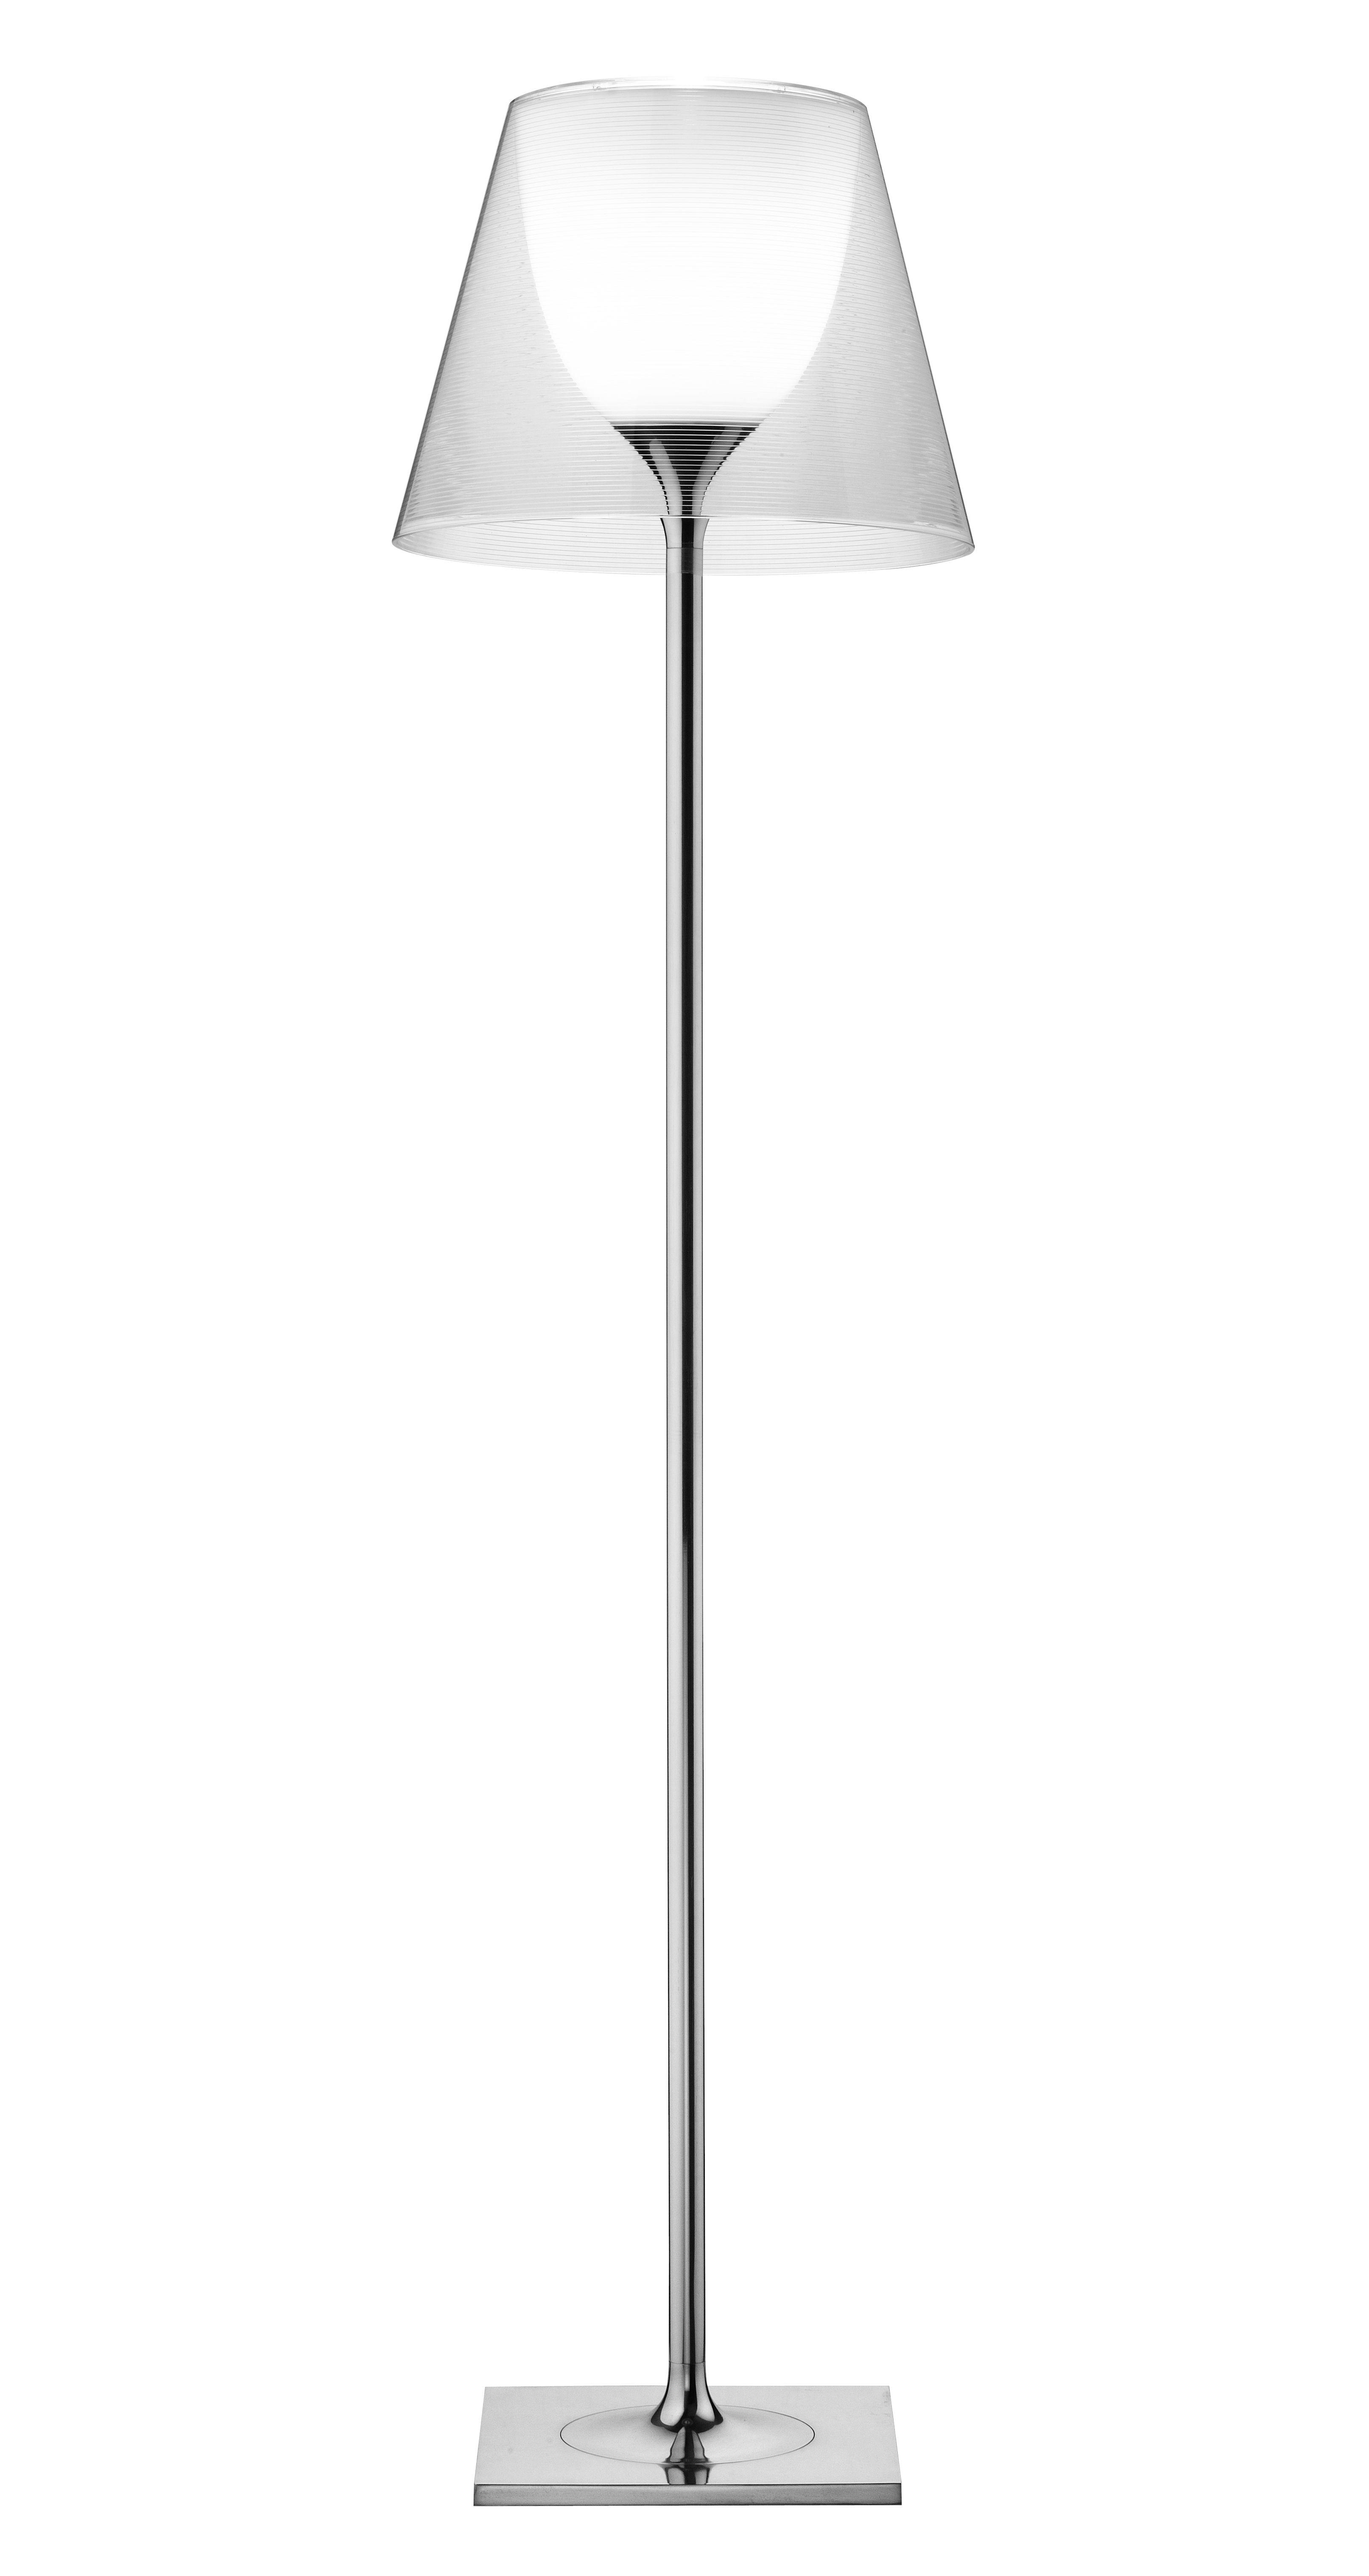 Lighting - Floor lamps - K Tribe F2 Floor lamp - H 162 cm by Flos - Transparent - PMMA, Polished aluminium